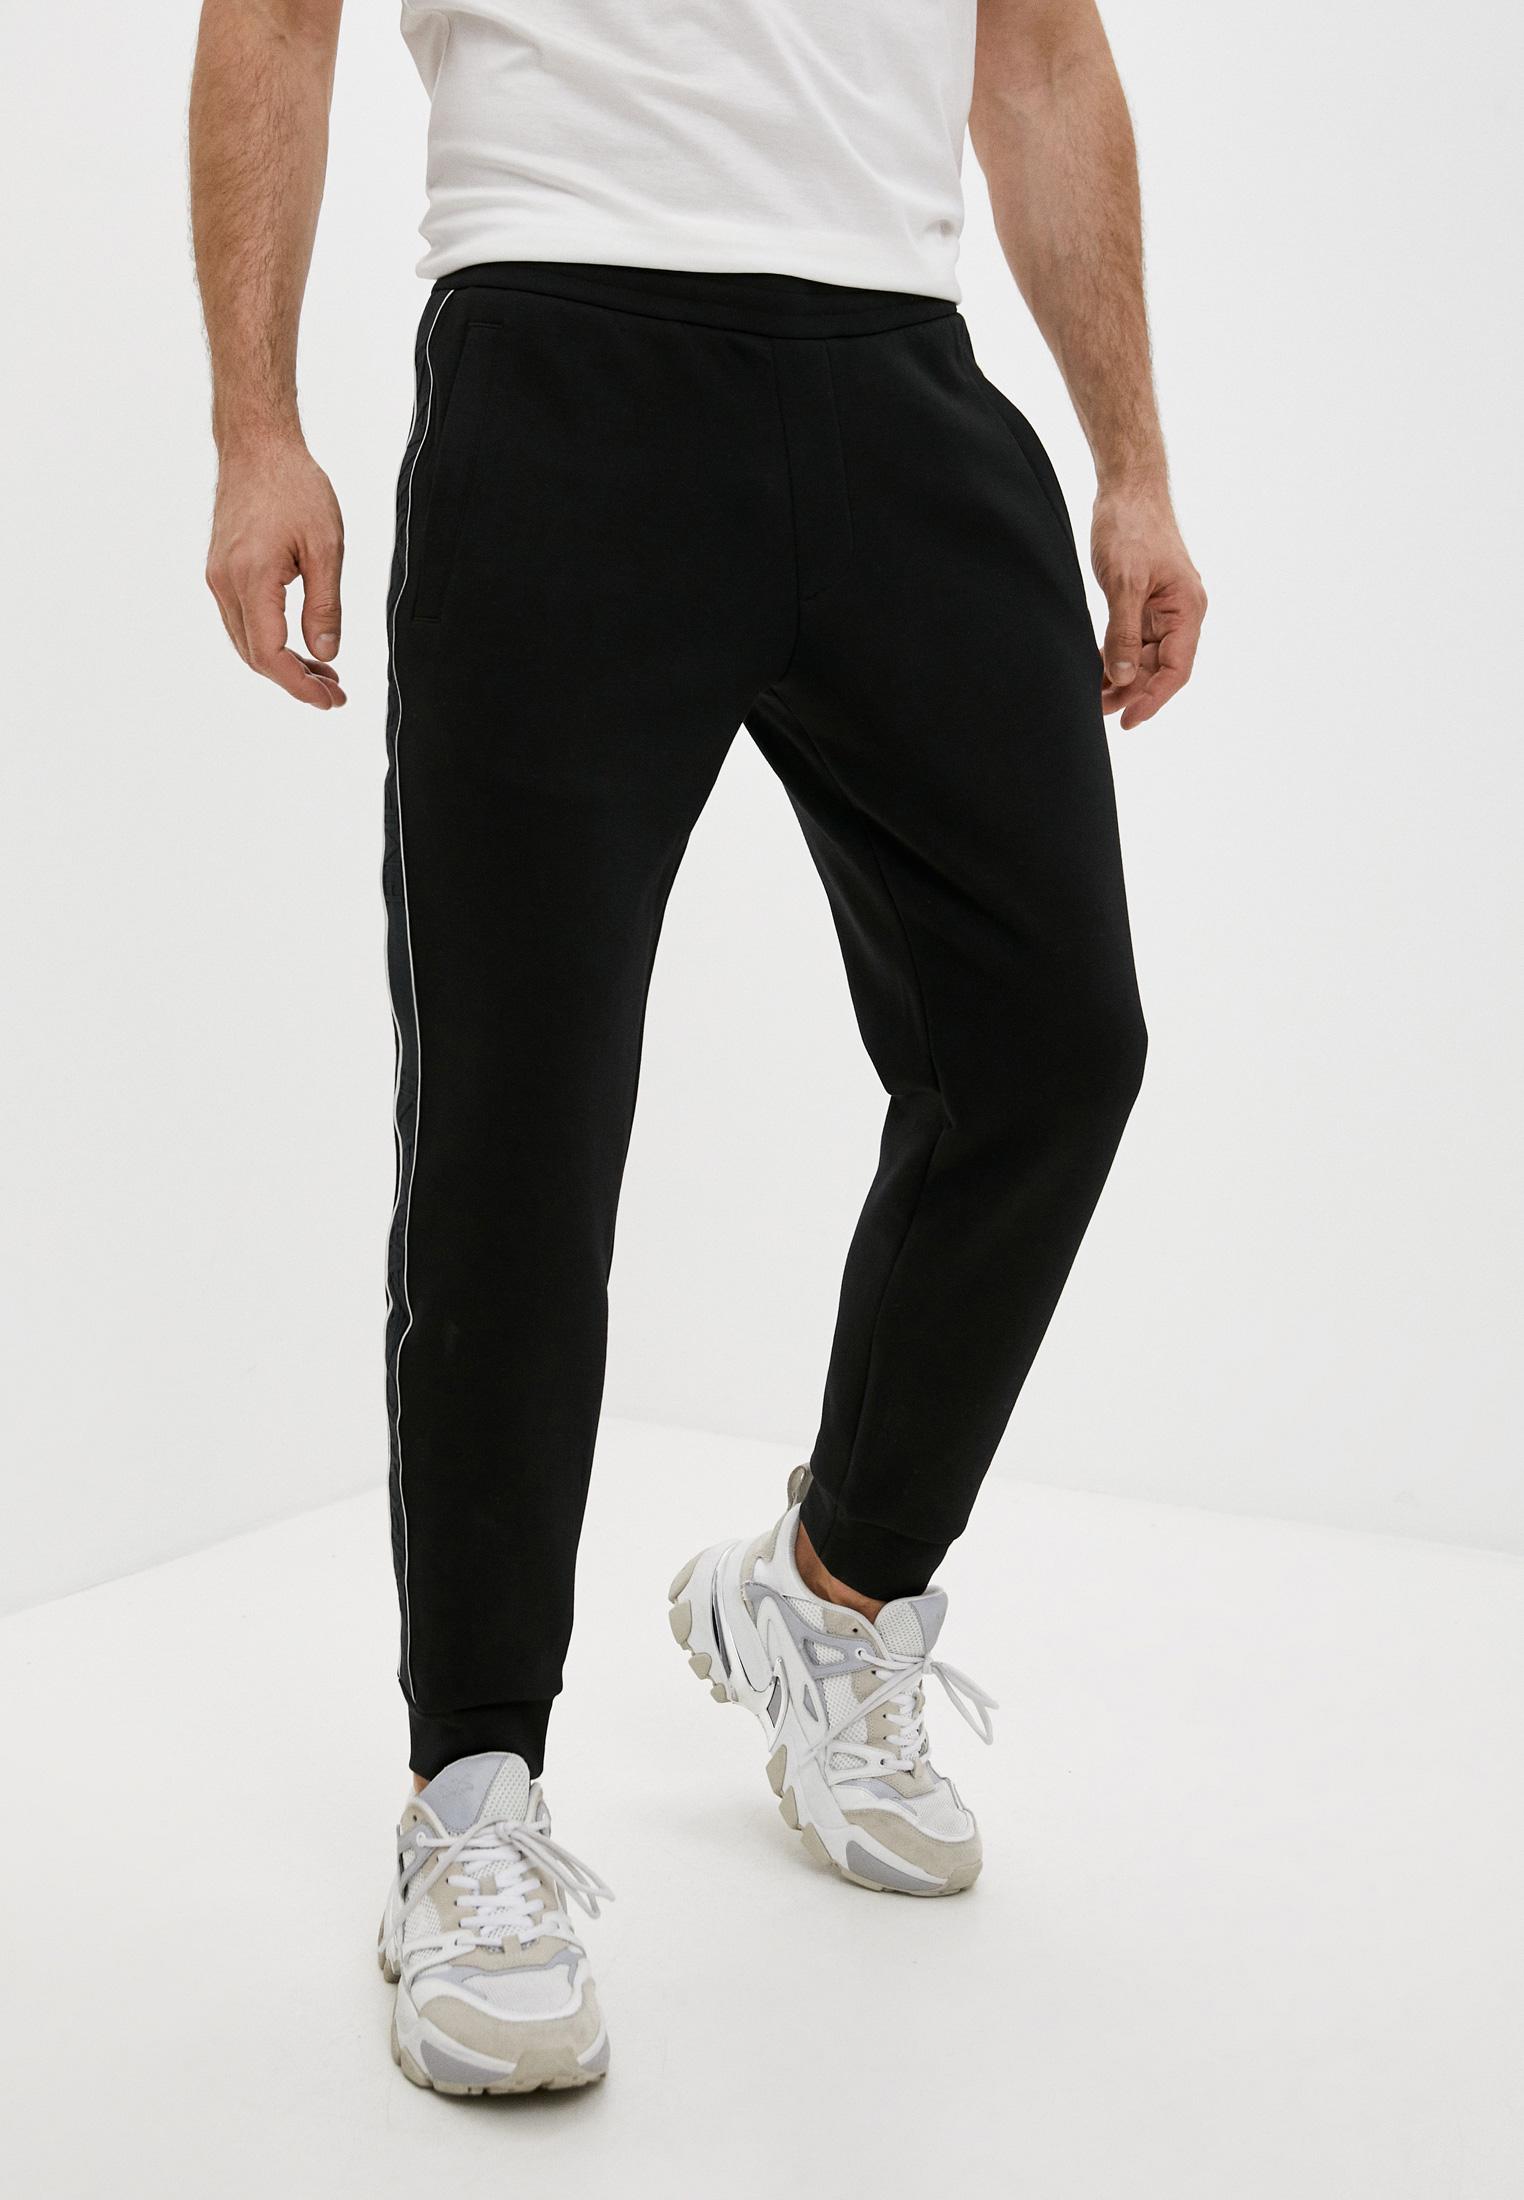 Мужские спортивные брюки Emporio Armani (Эмпорио Армани) Брюки спортивные Emporio Armani